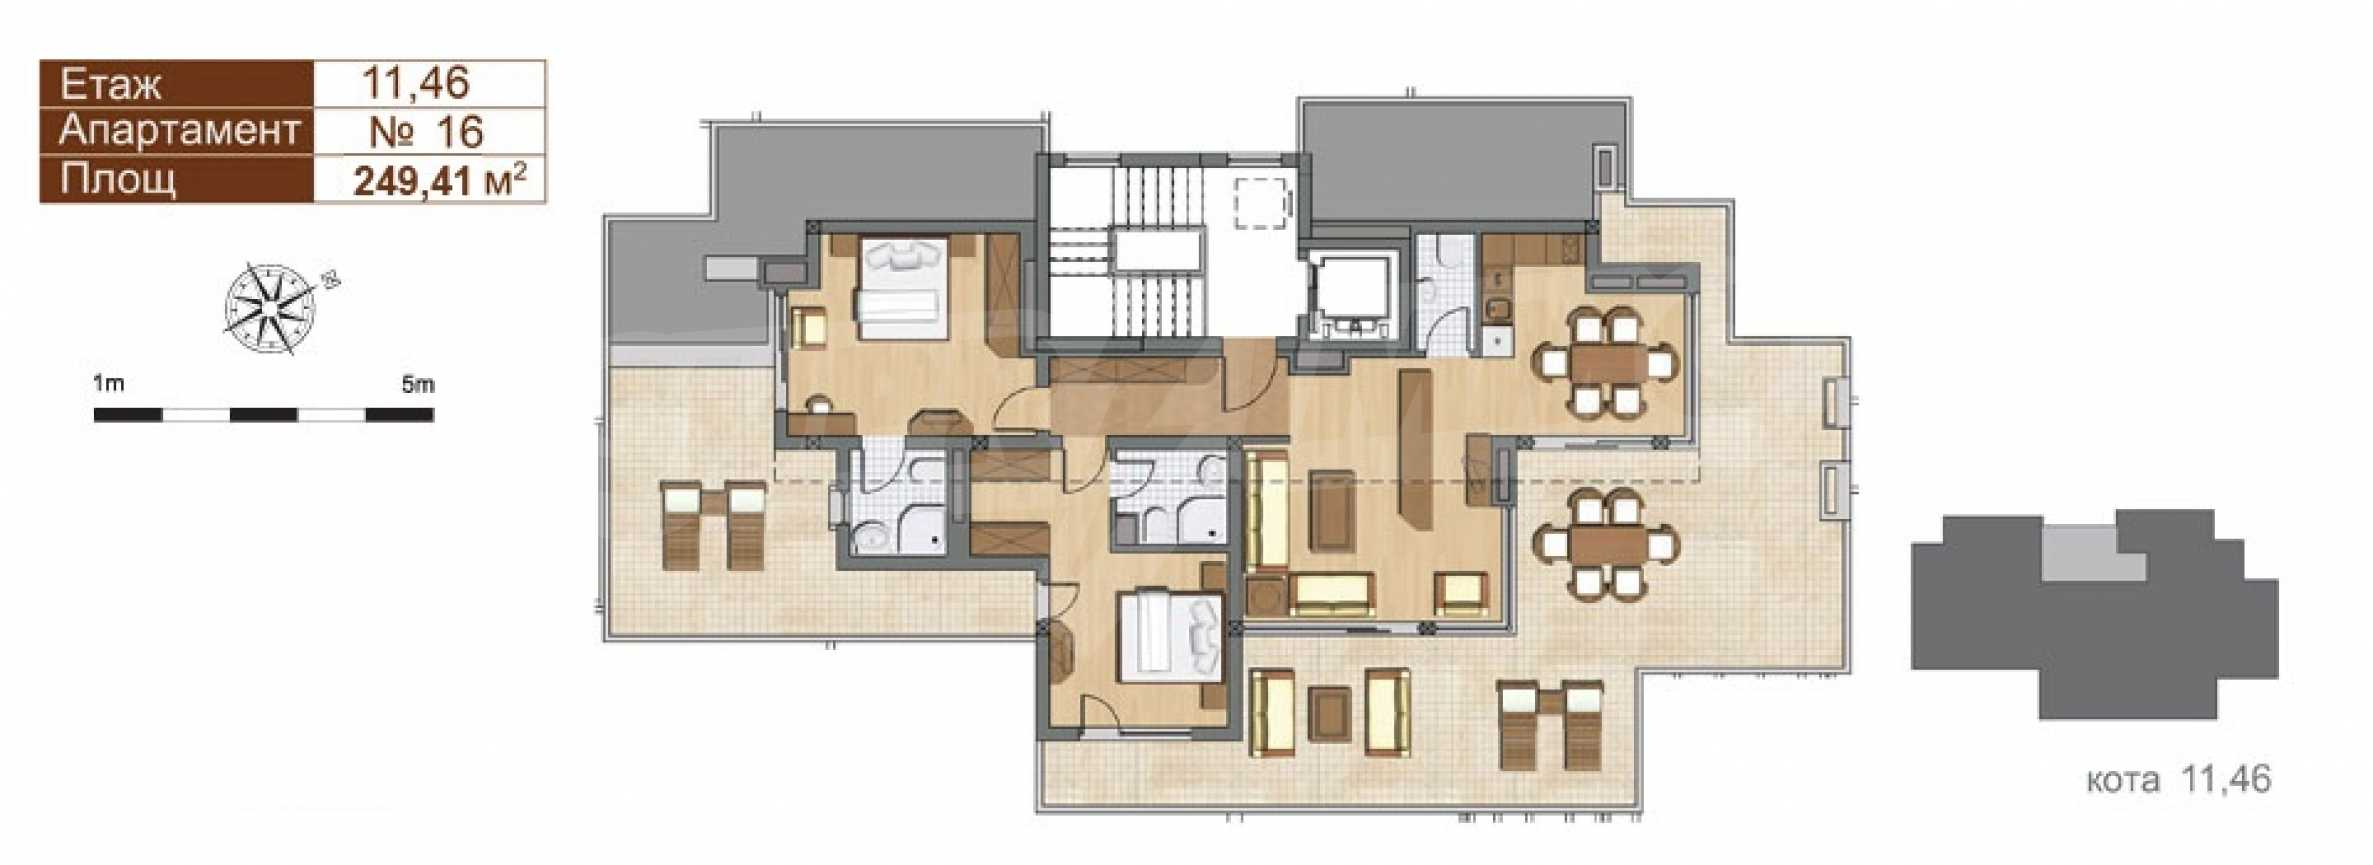 Прекрасная трехкомнатная квартира с видом на море на первой линии 8